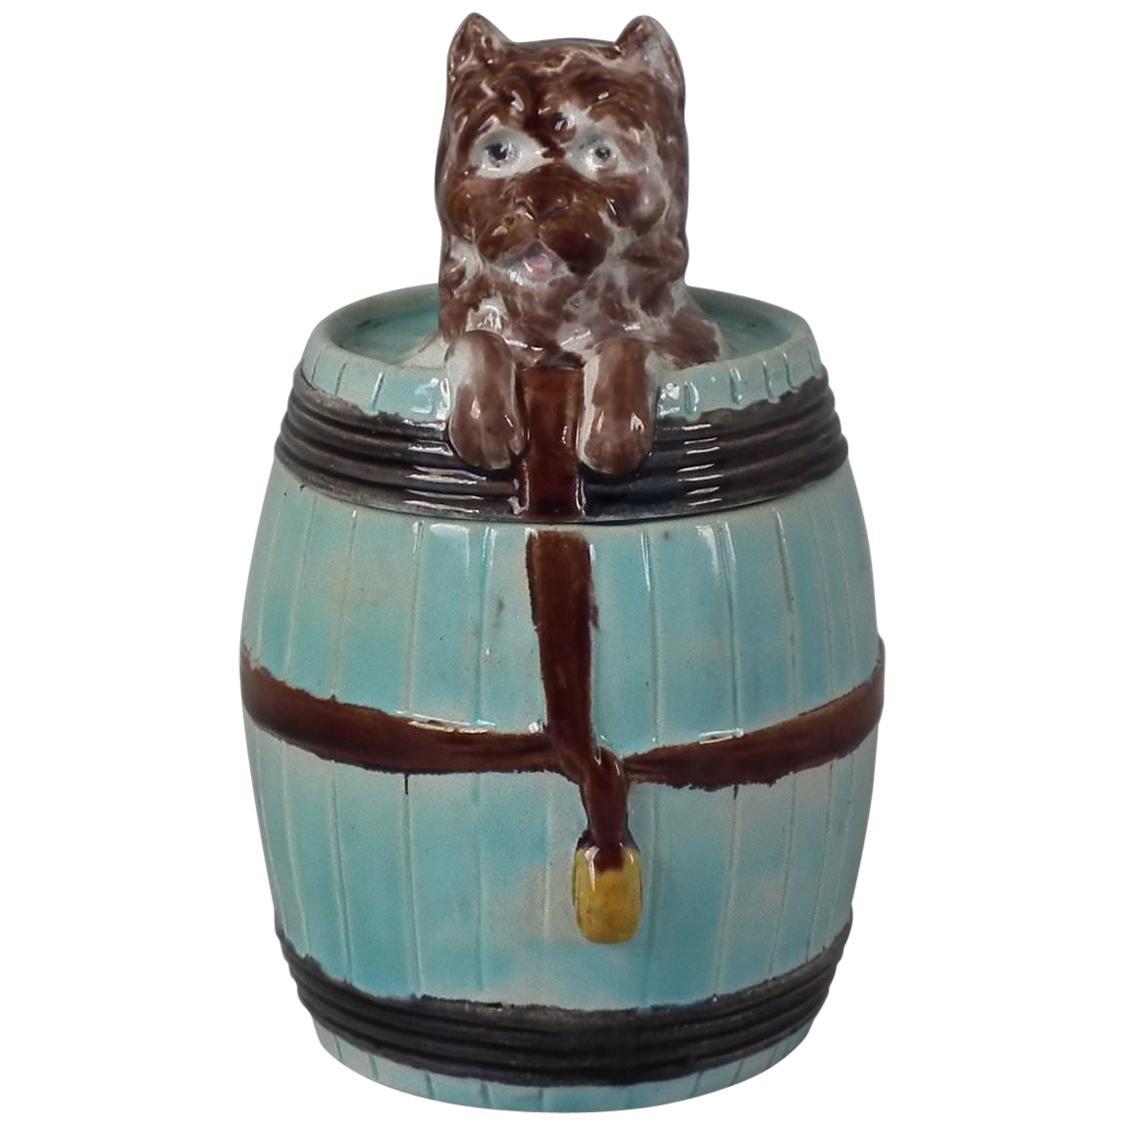 Majolica Dog in Barrel Tobacco Jar and Cover